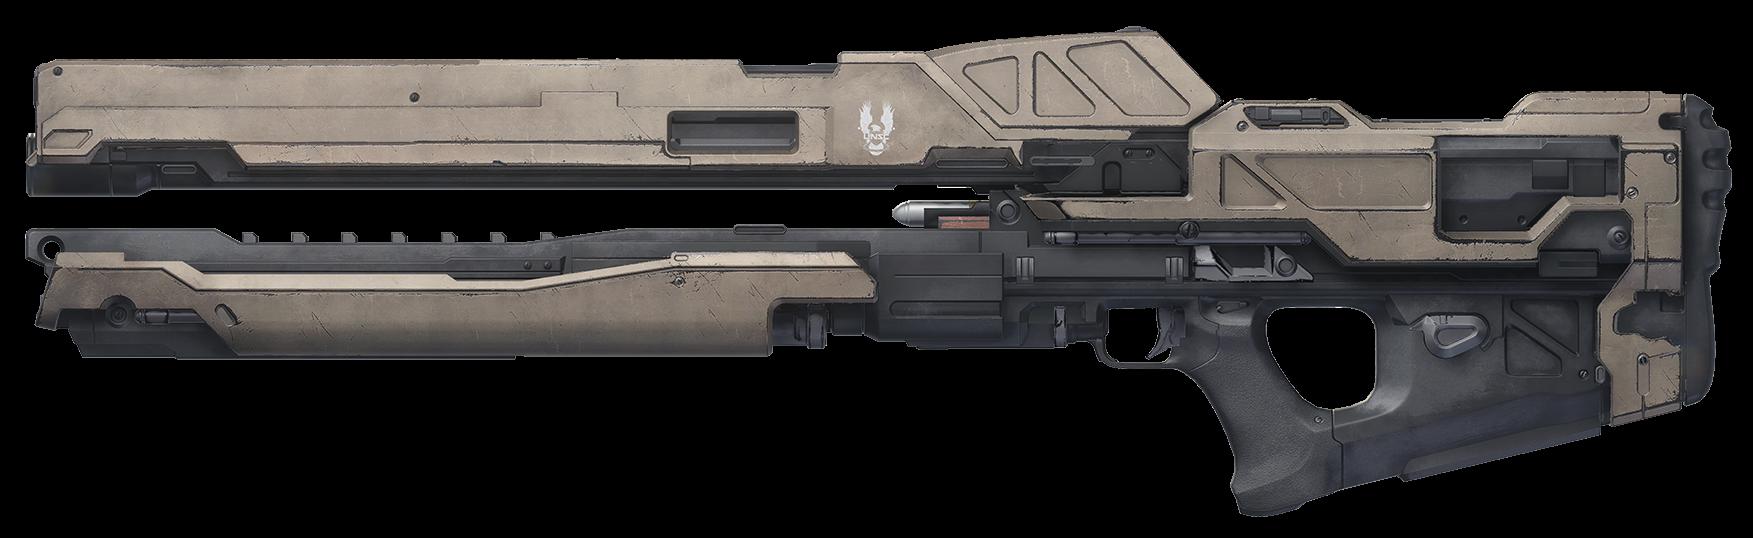 Asymmetric Recoilless Carbine-920